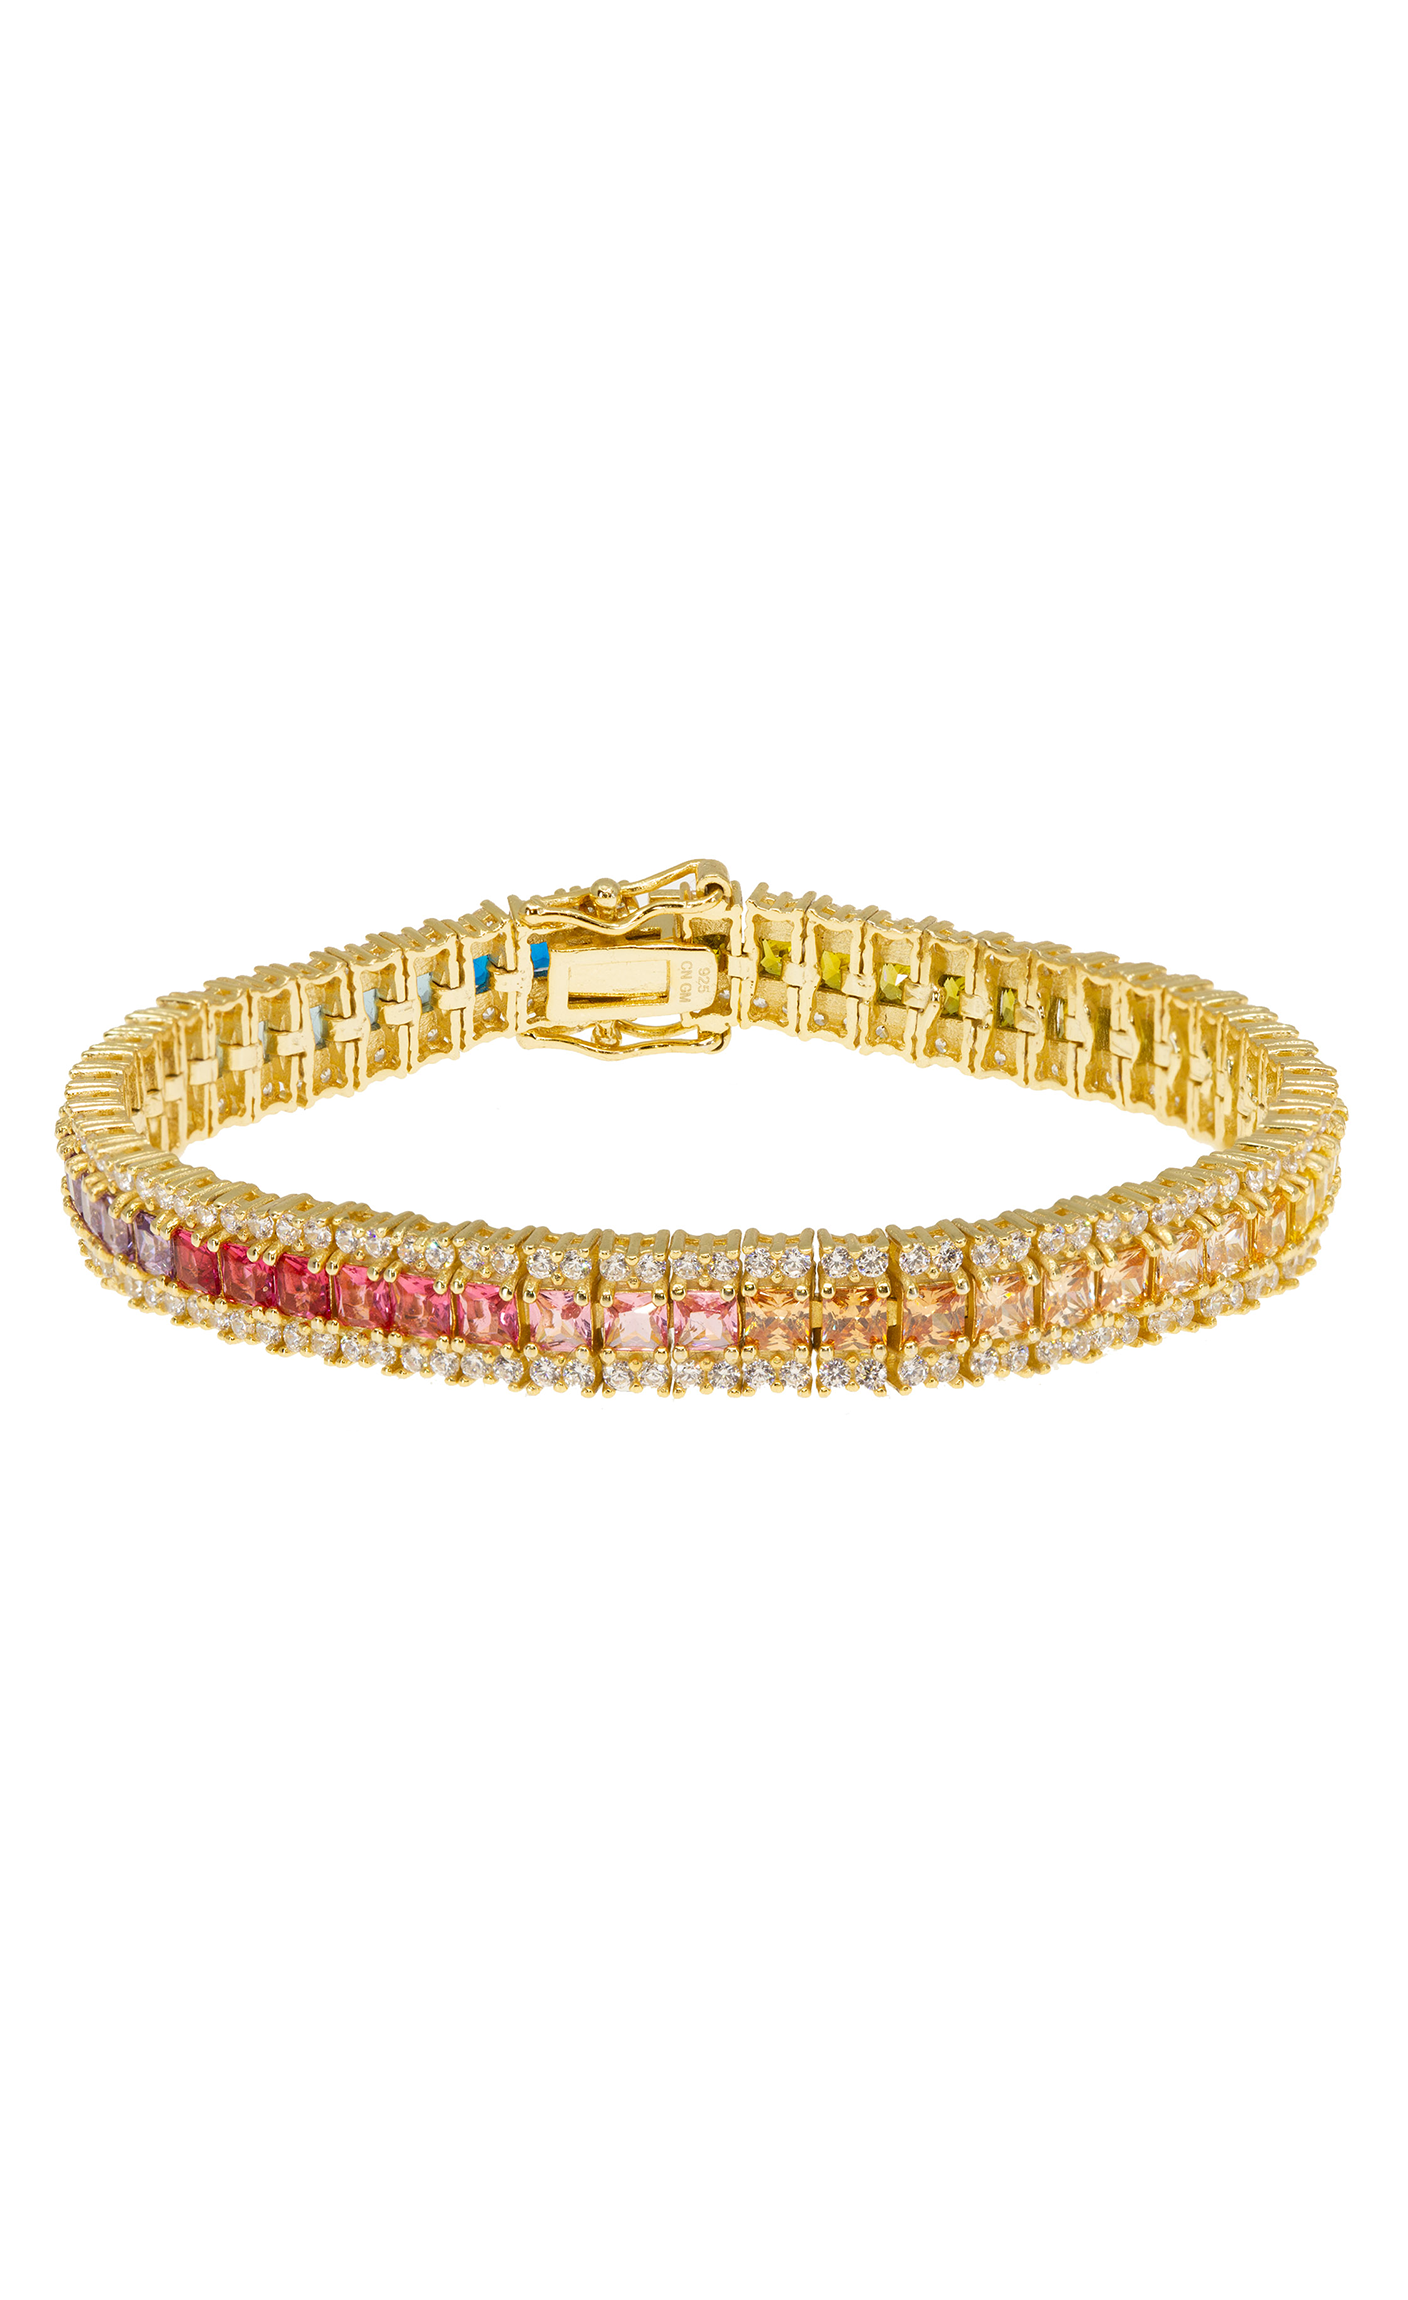 925 Cn Gm : Jordan, Meath, Ombre, Wedding, Diamond, Bangles, Bracelet,, Gemstones, Jewelry, Rings,, Bracelet, Online